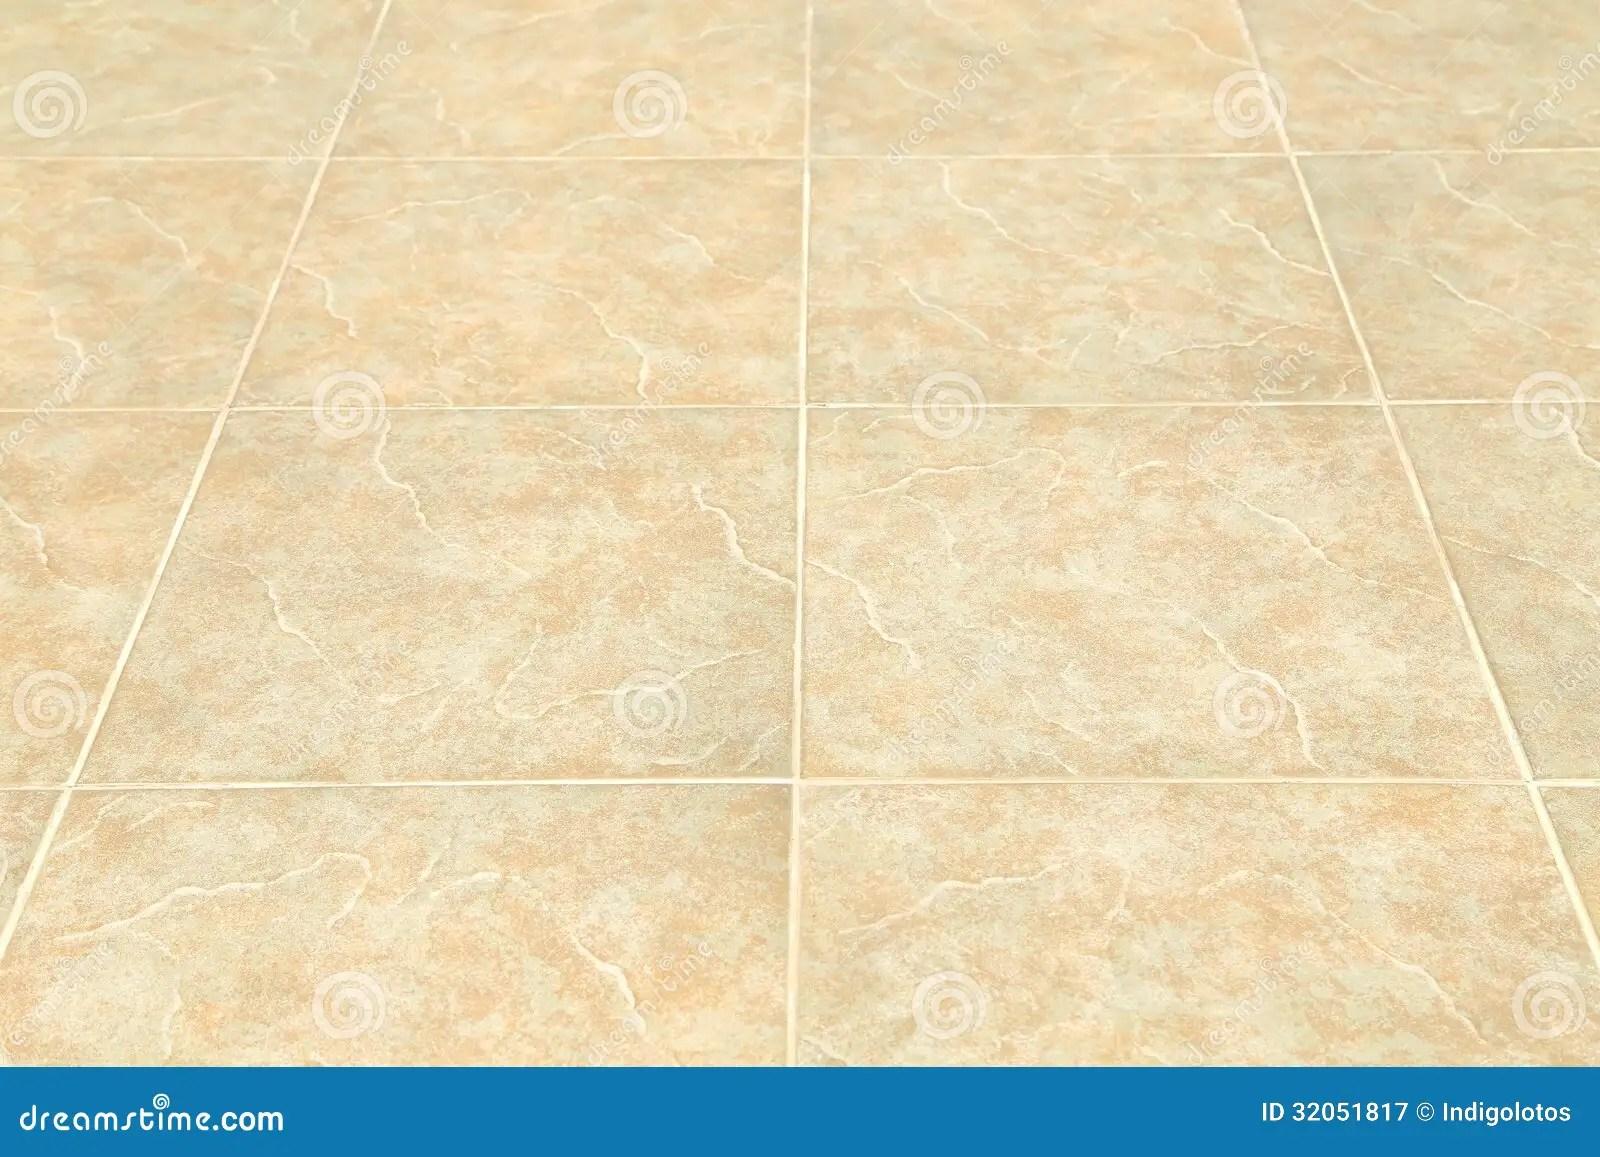 Brown Ceramic Floor Tiles Closeup Texture Royalty Free